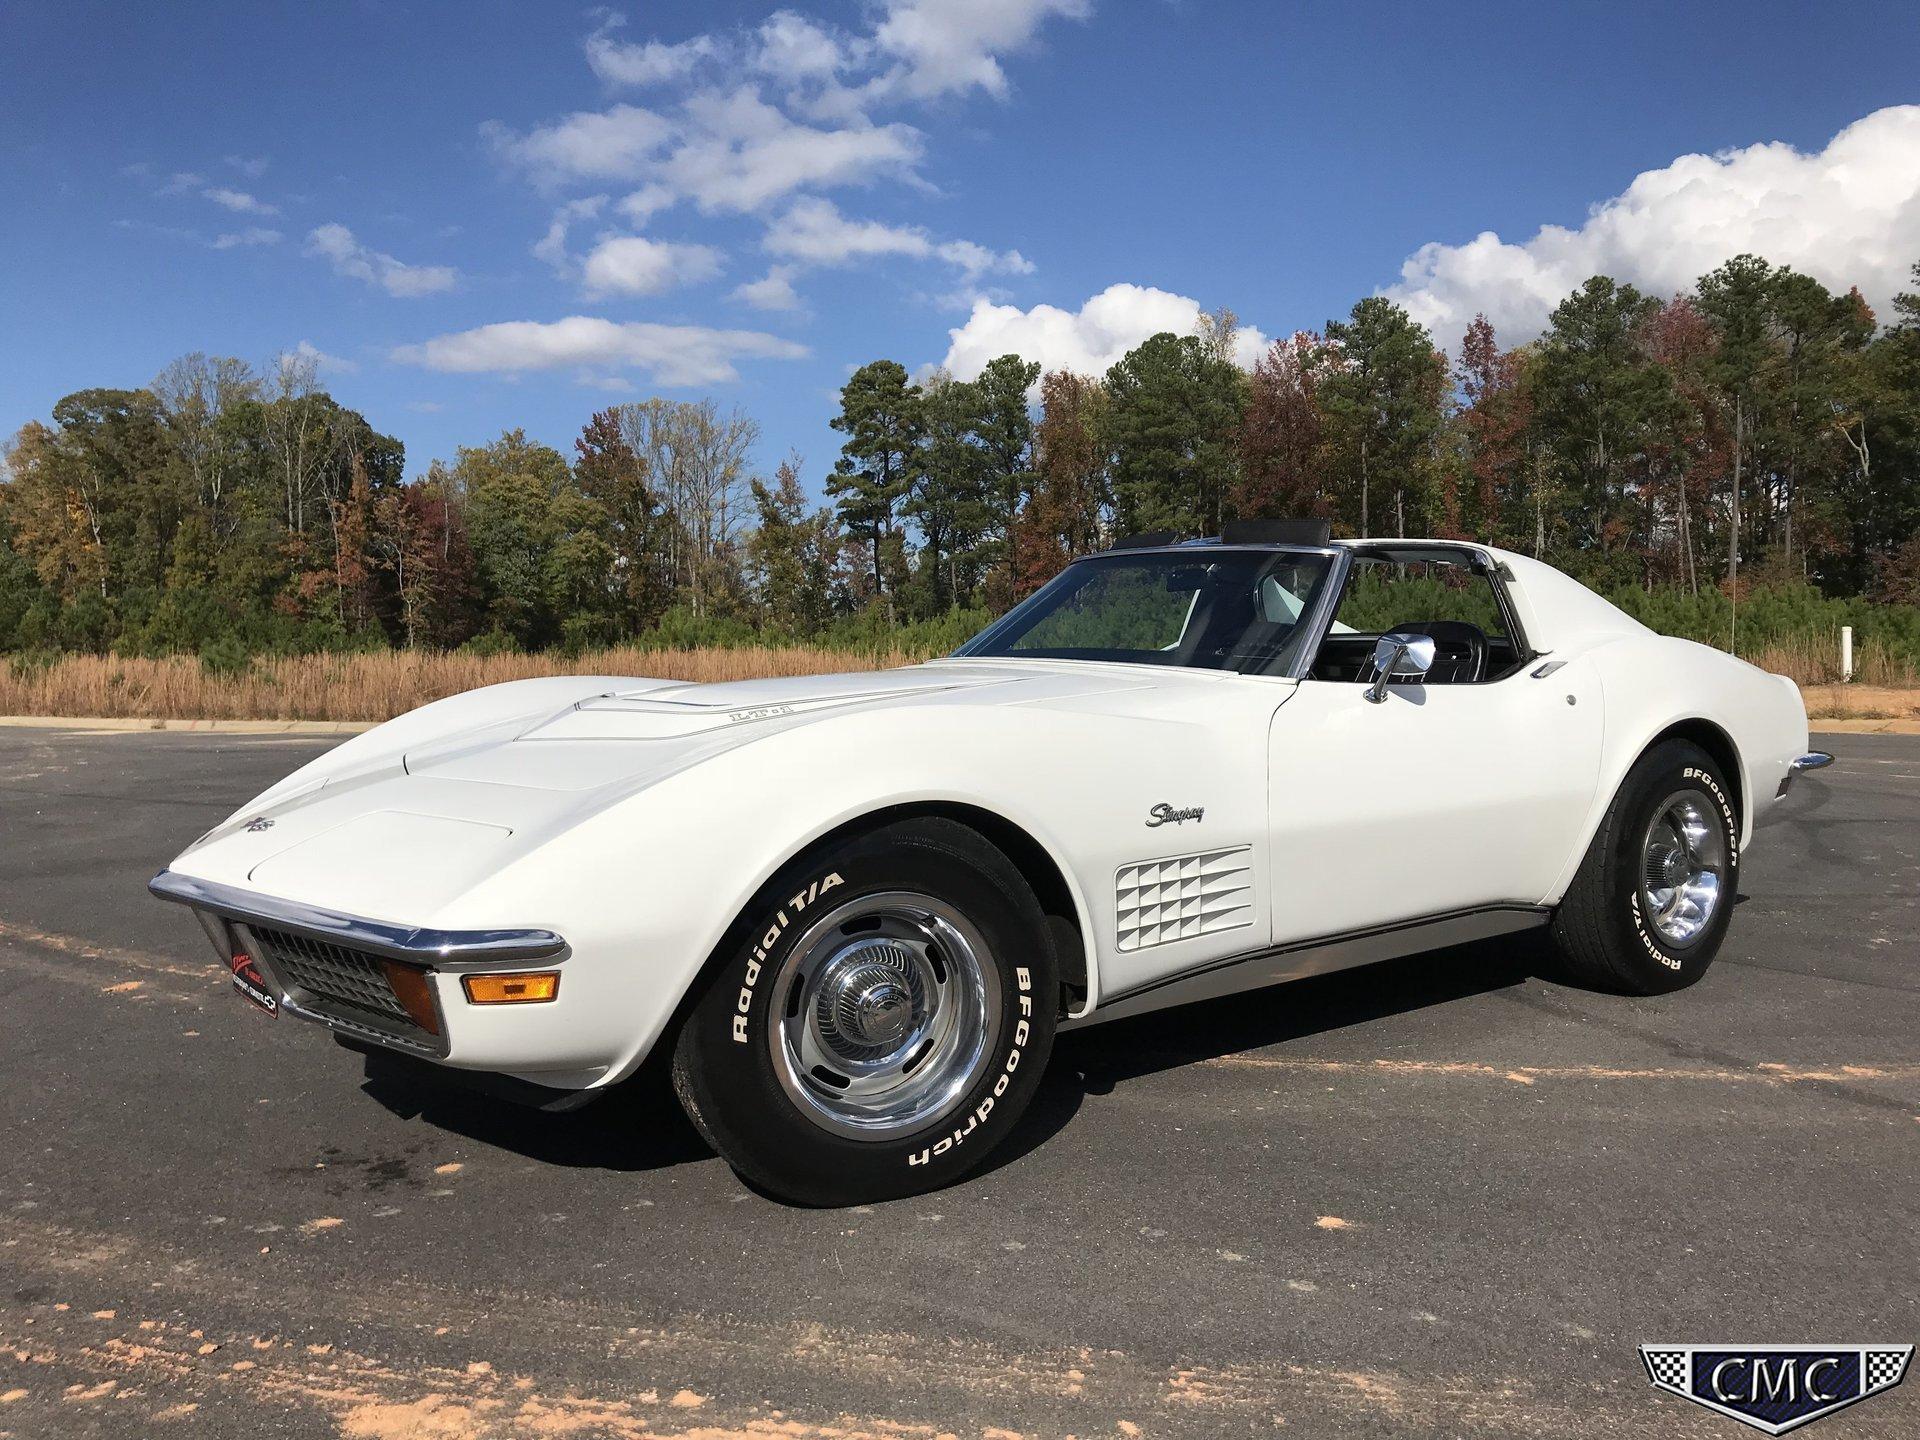 1972 chevrolet corvette carolina muscle cars inc rh carolinamusclecarsinc com 7 Speed Manual Transmission 8 Speed Manual Transmission